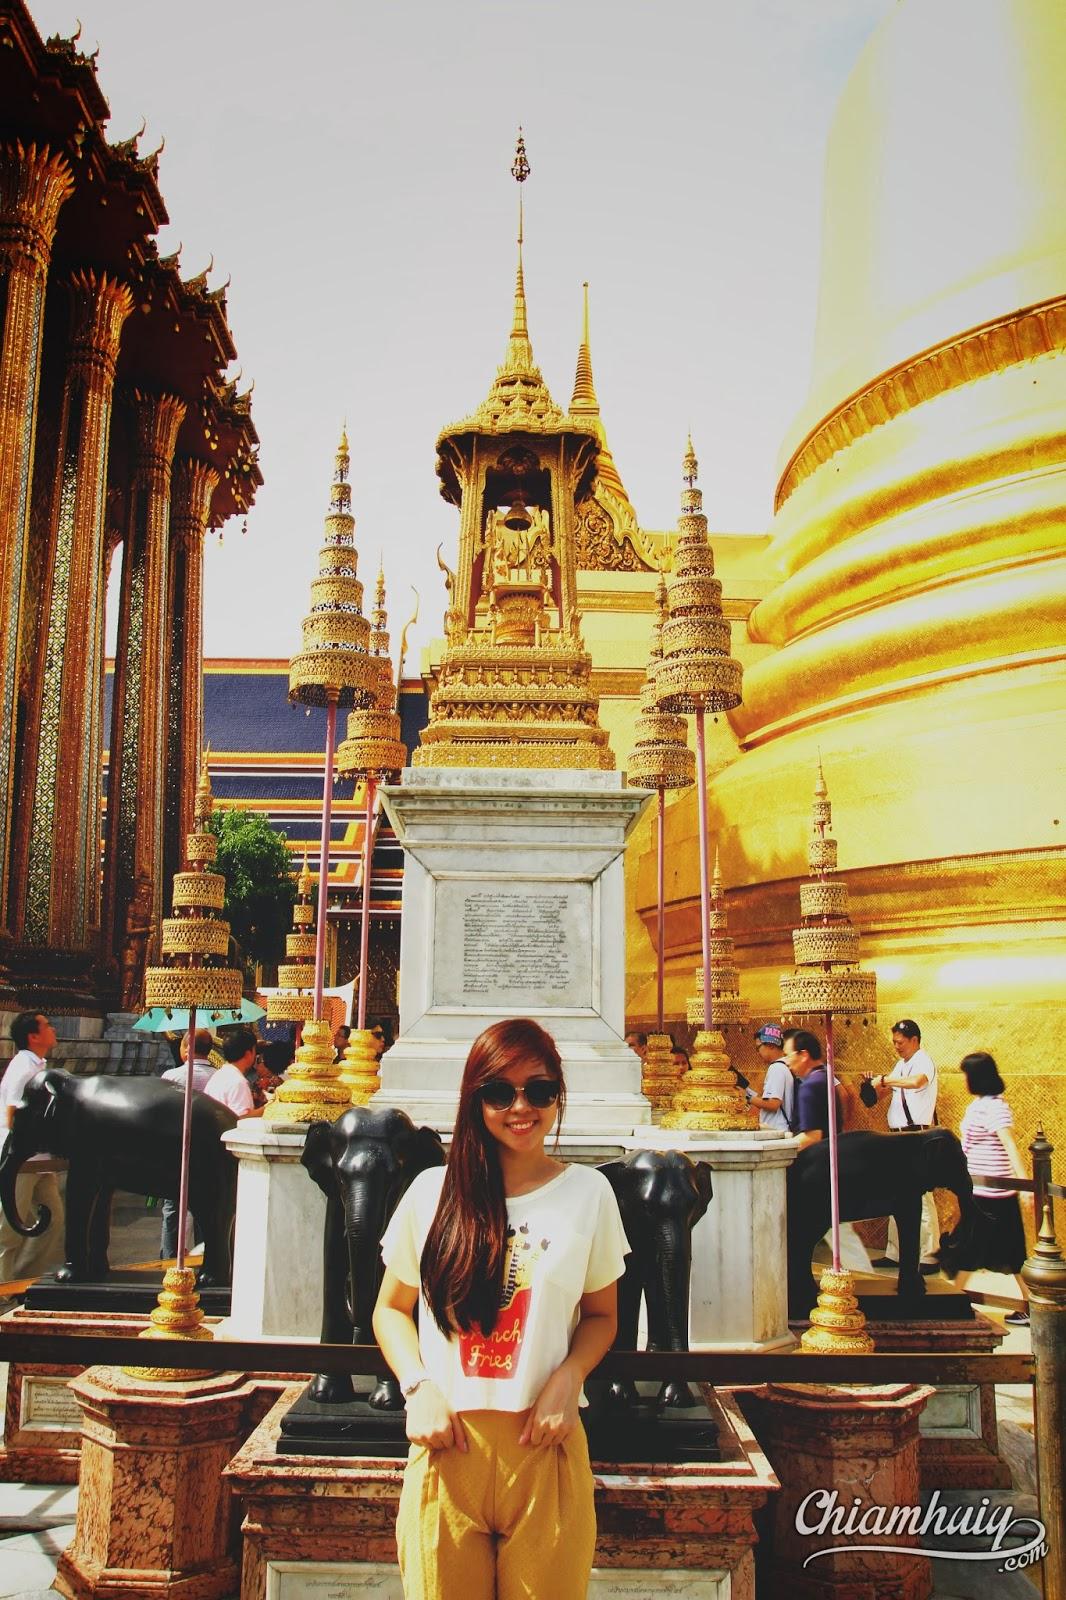 Bangkok's Grand Palace: The Complete Guide - tripsavvy.com